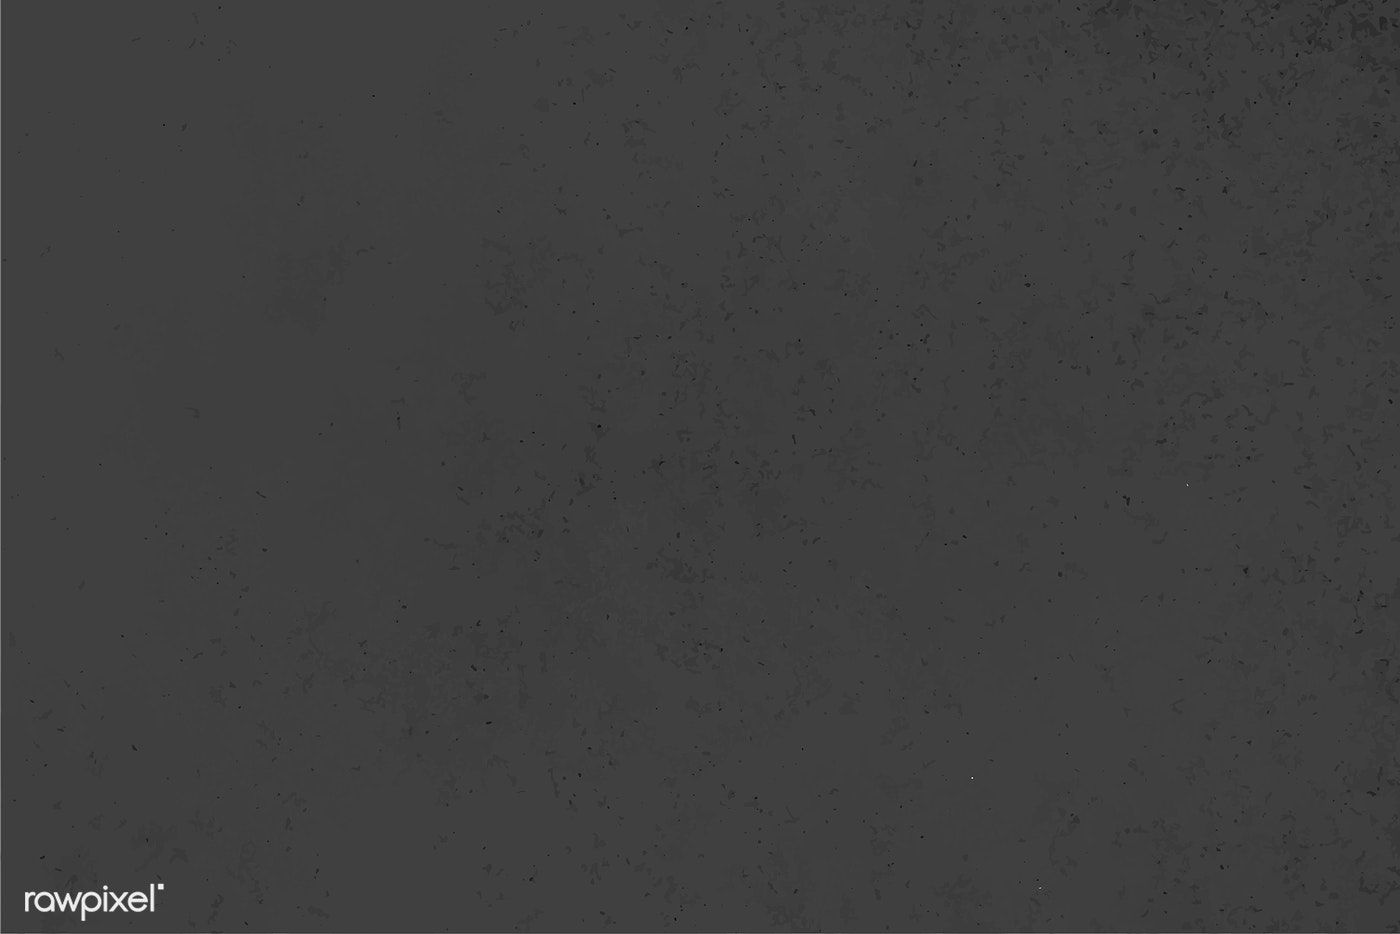 Dark Gray Plain Concrete Textured Background Free Image By Rawpixel Com Hwangmangjoo Dark Grey Wallpaper Textured Background Concrete Texture